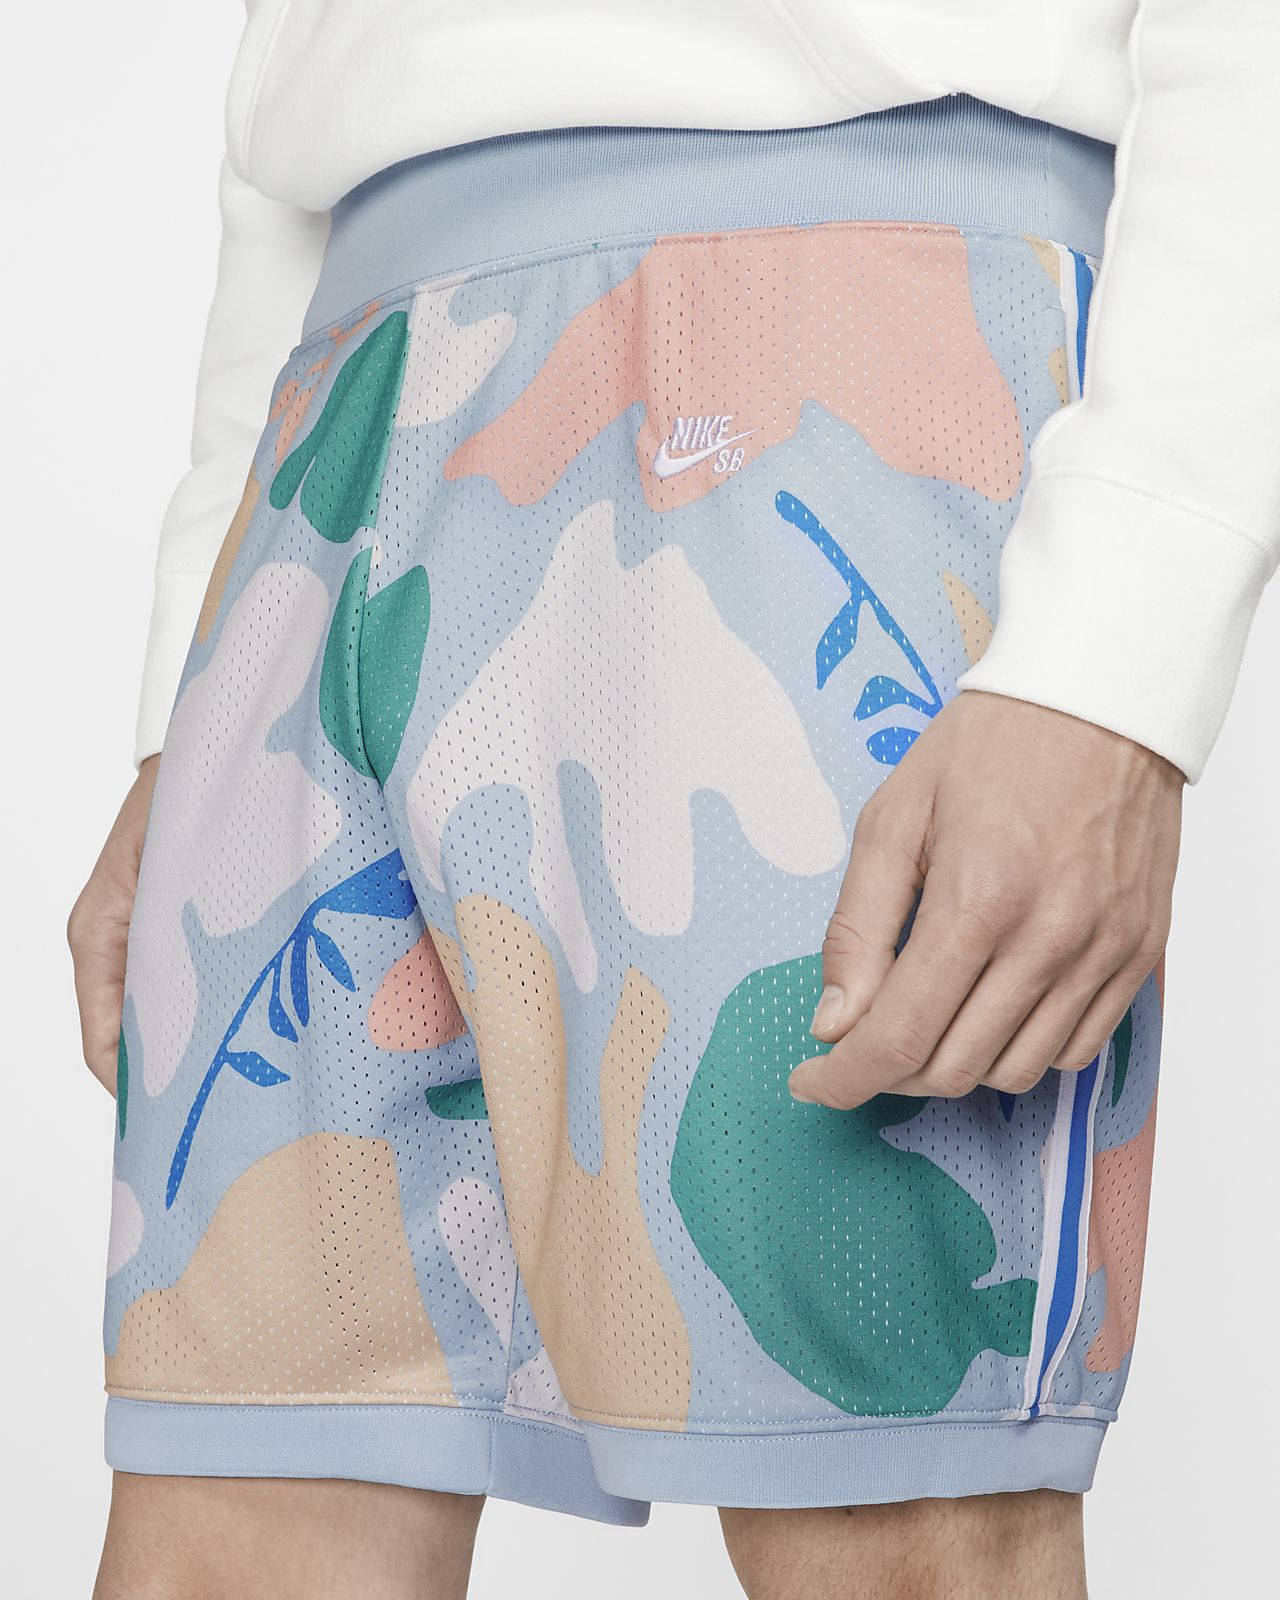 Nike SB Dri-FIT Pantalons curts estampats de skateboard - Home